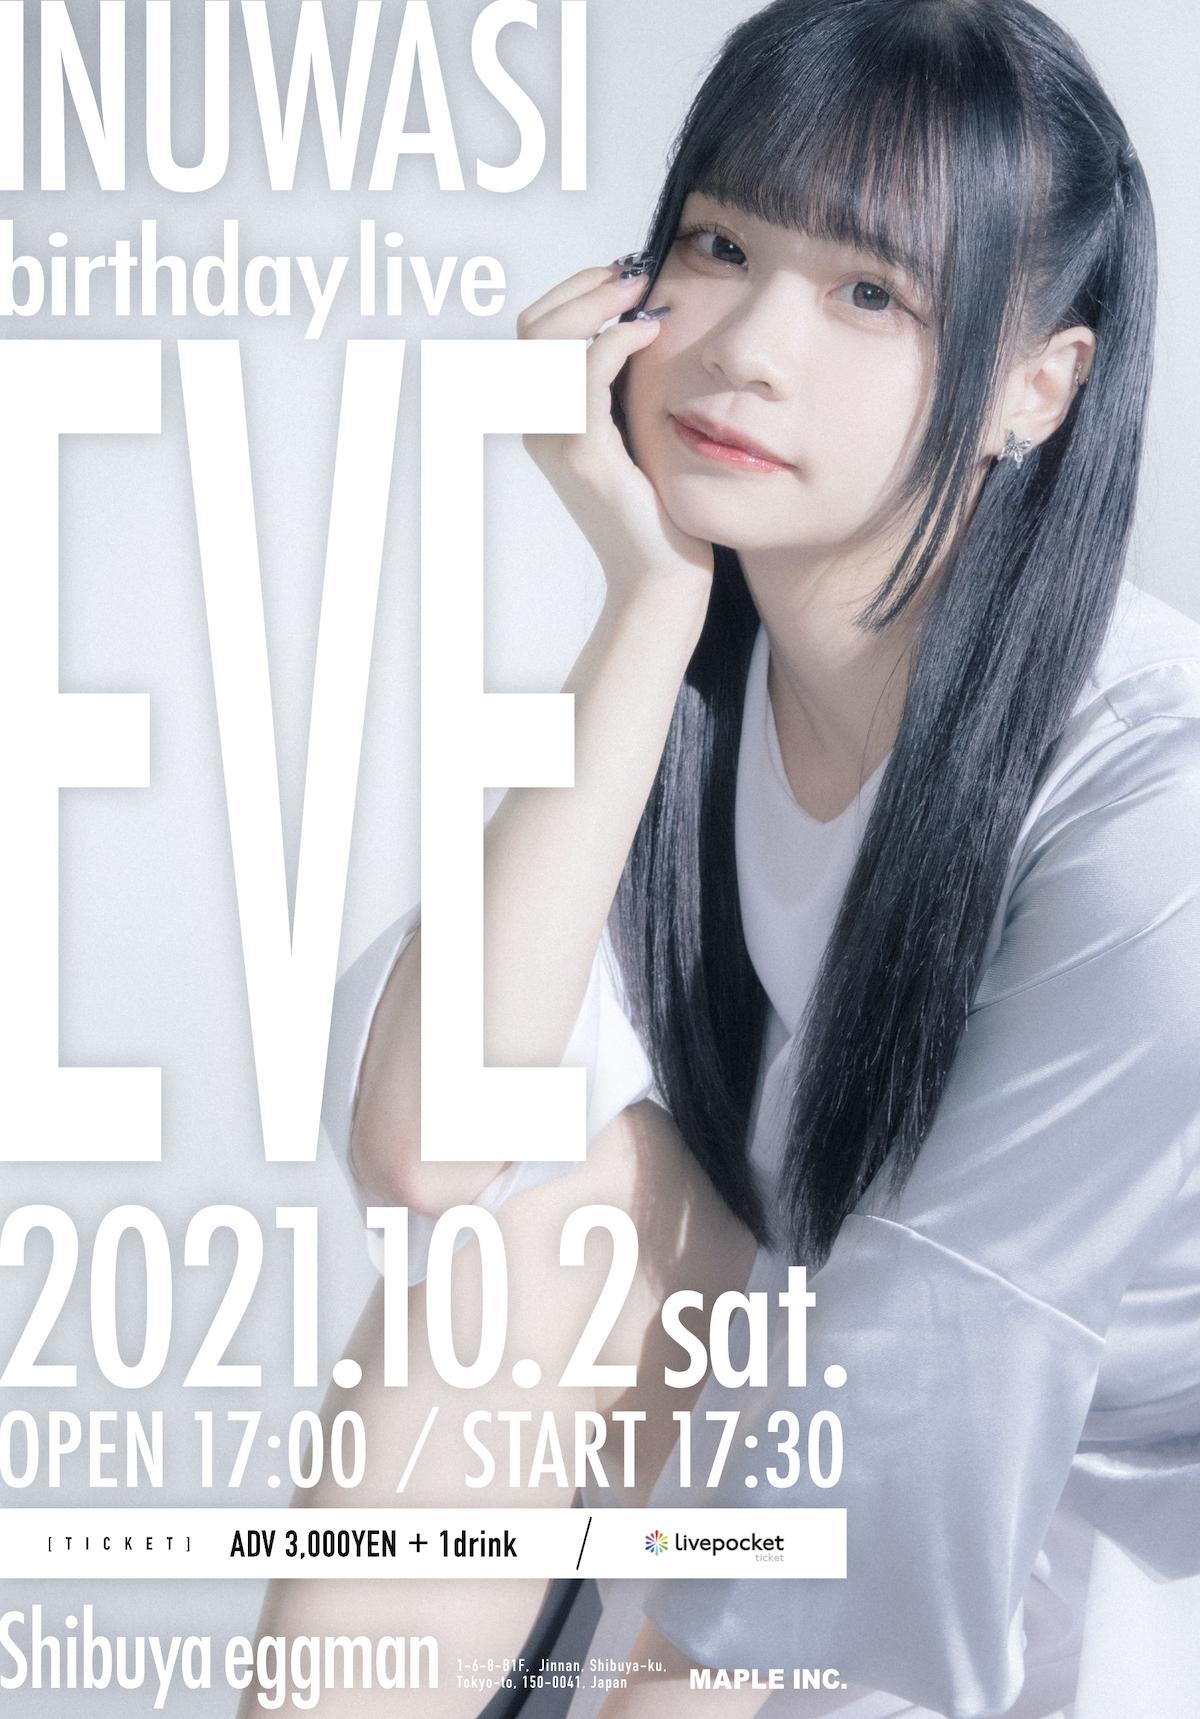 「 INUWASI birthday live – イヴ – 」